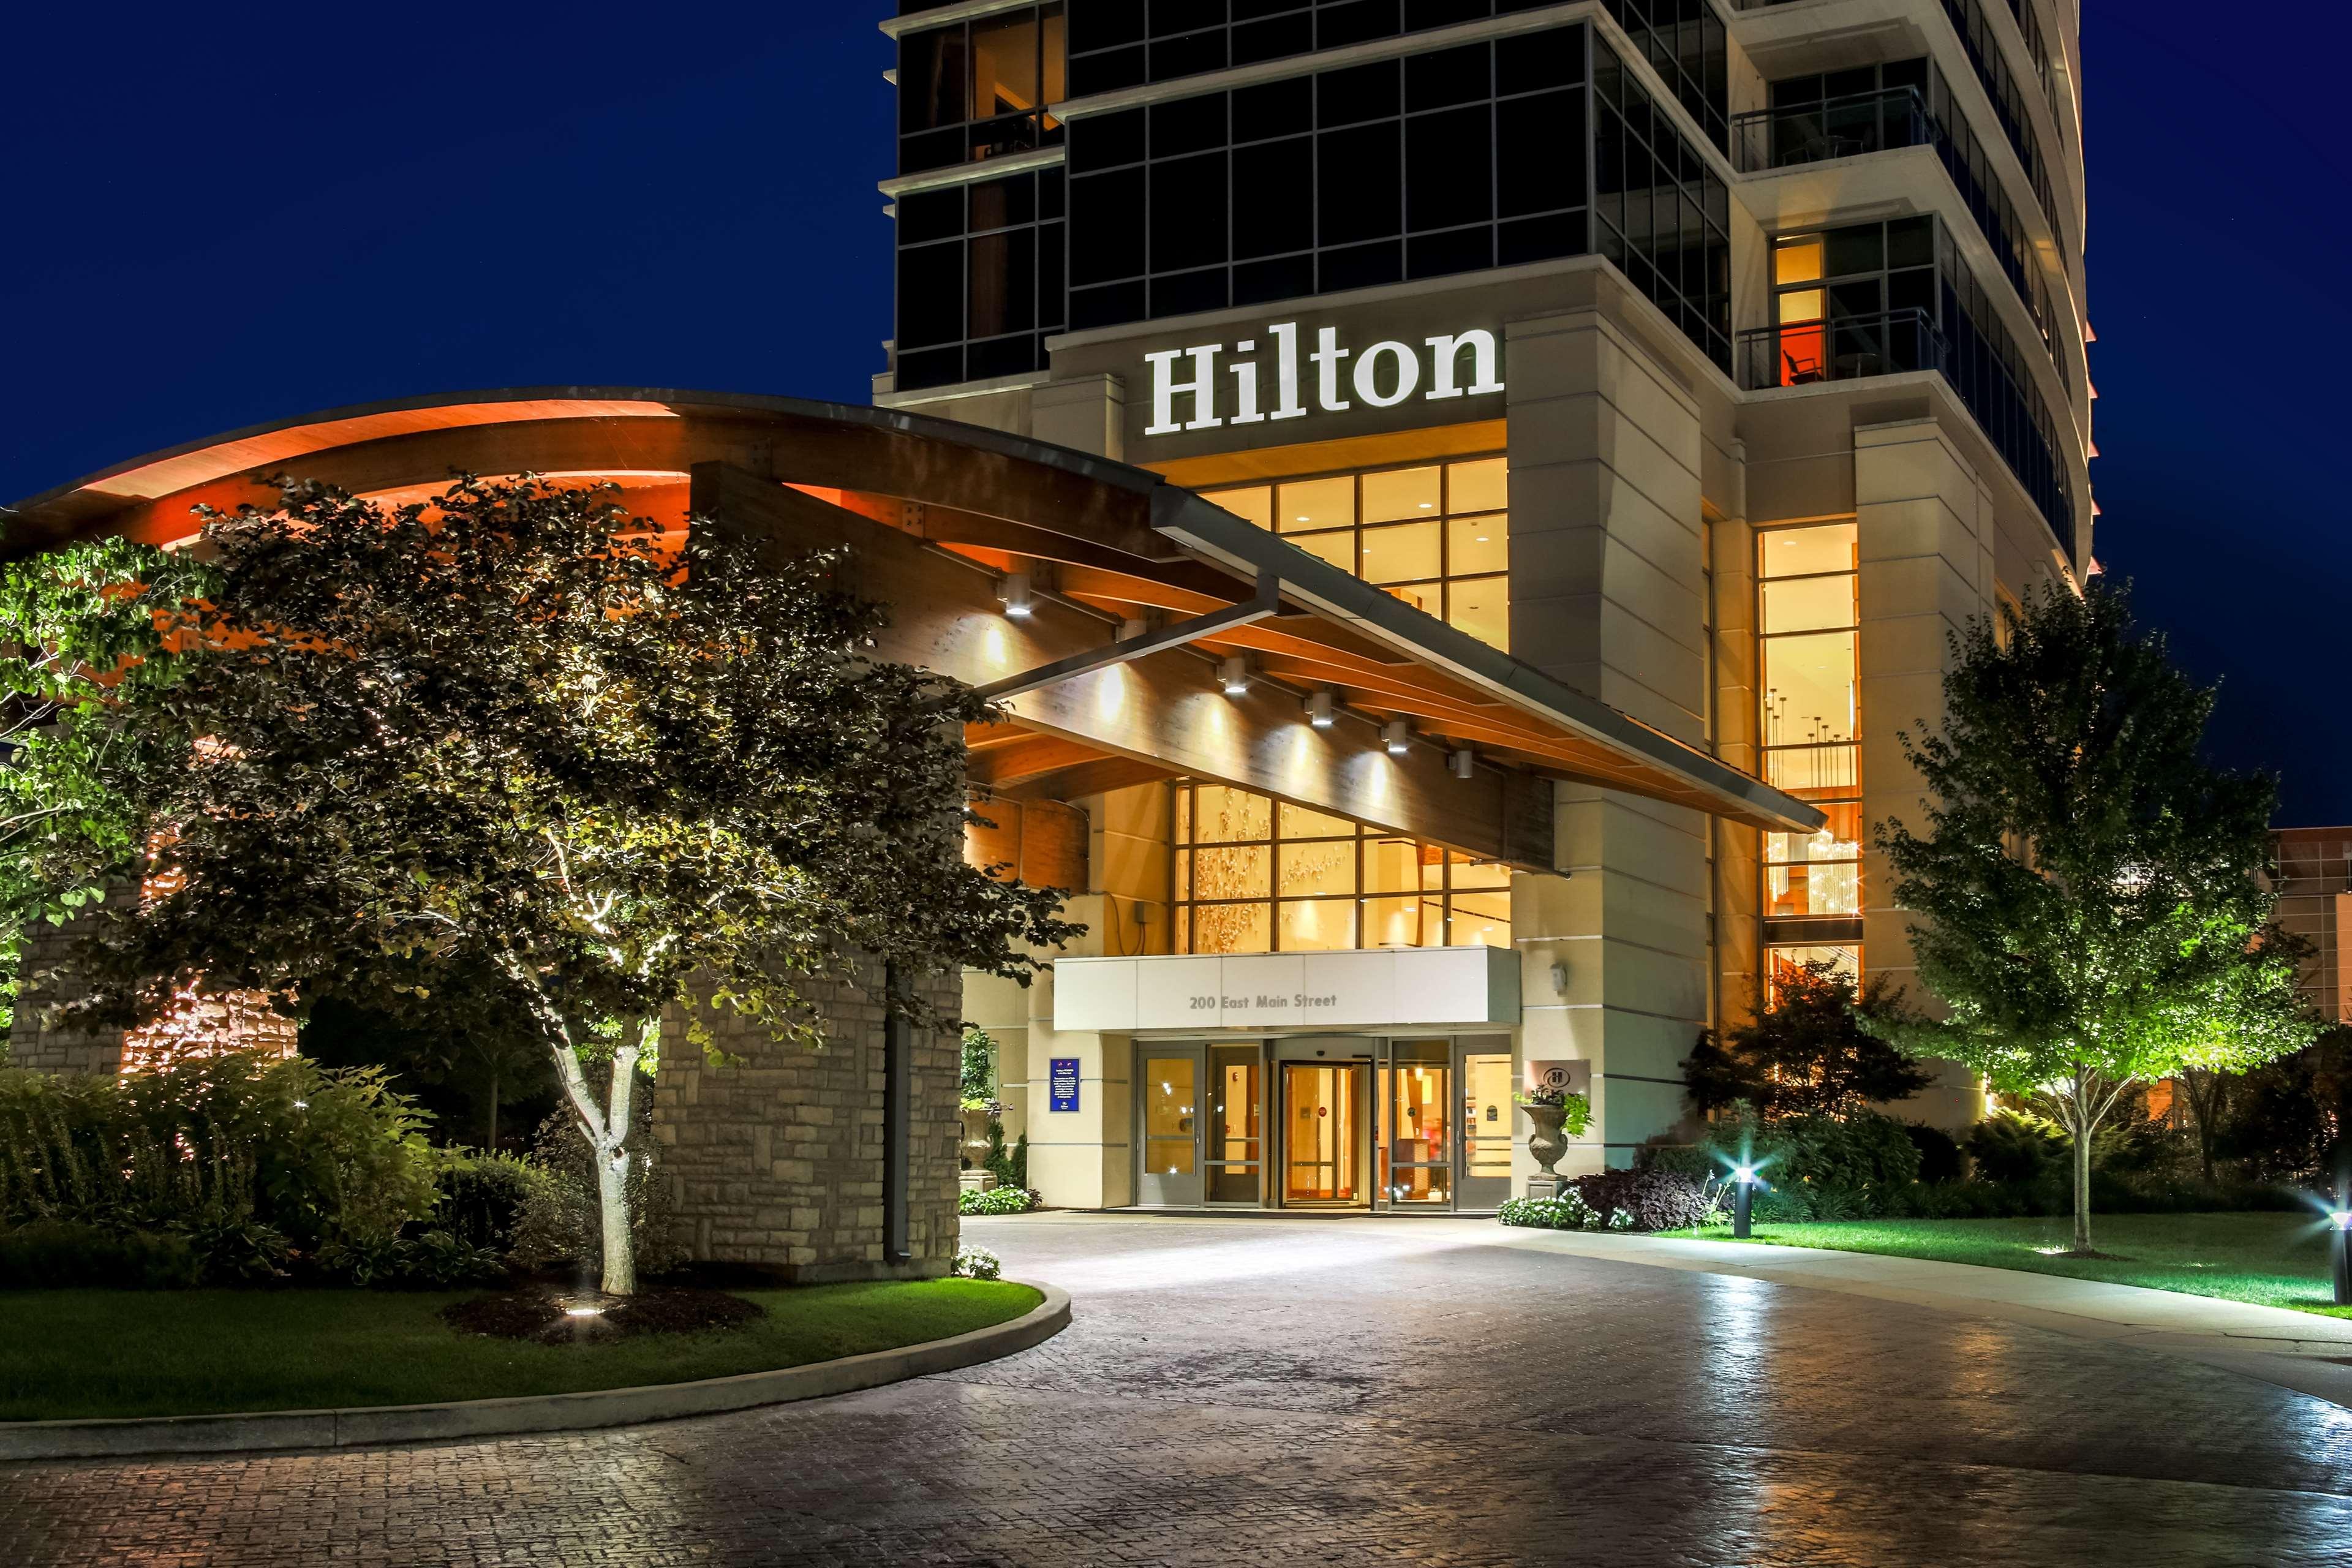 Hilton Branson Convention Center image 3